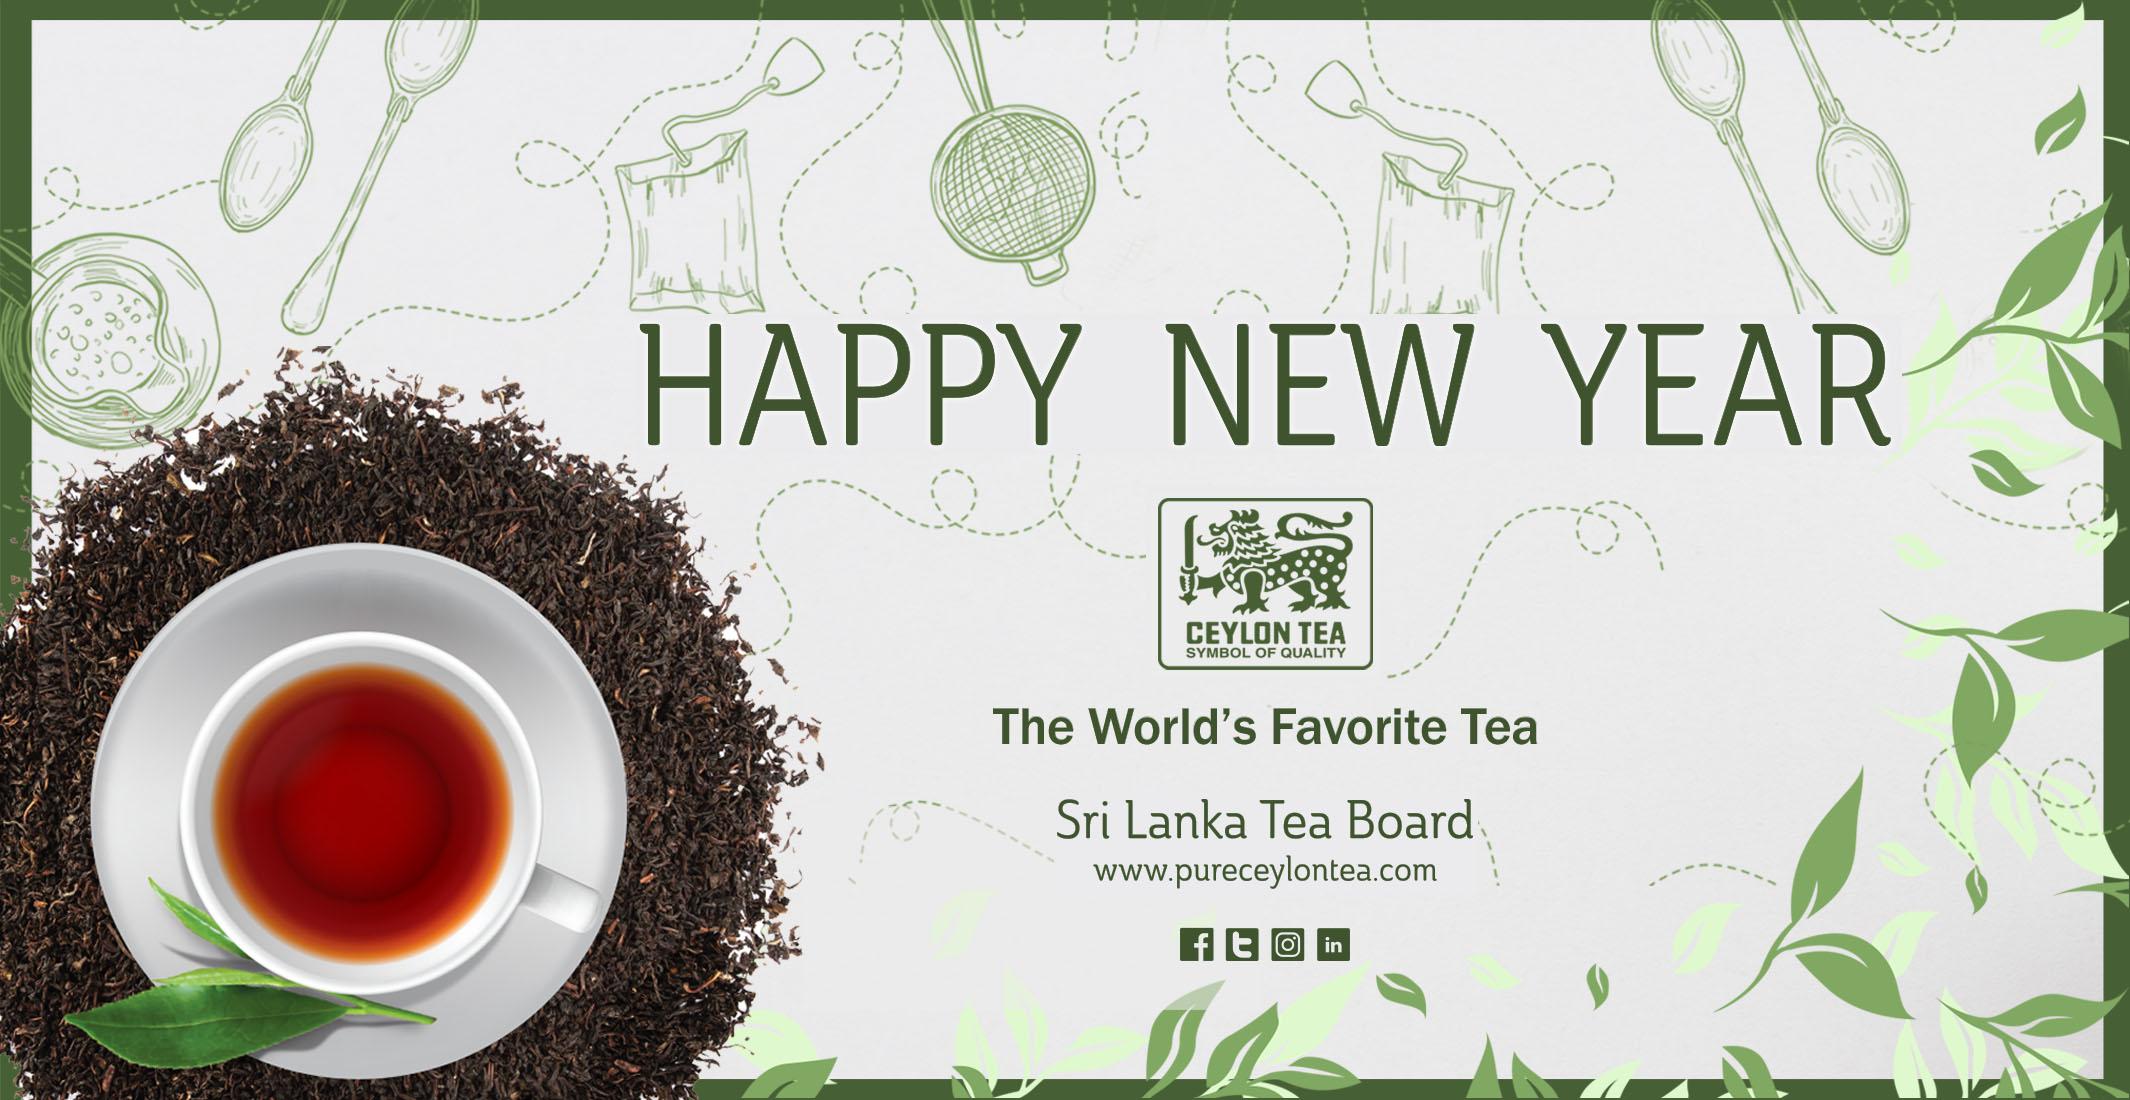 The World's Favorite Tea